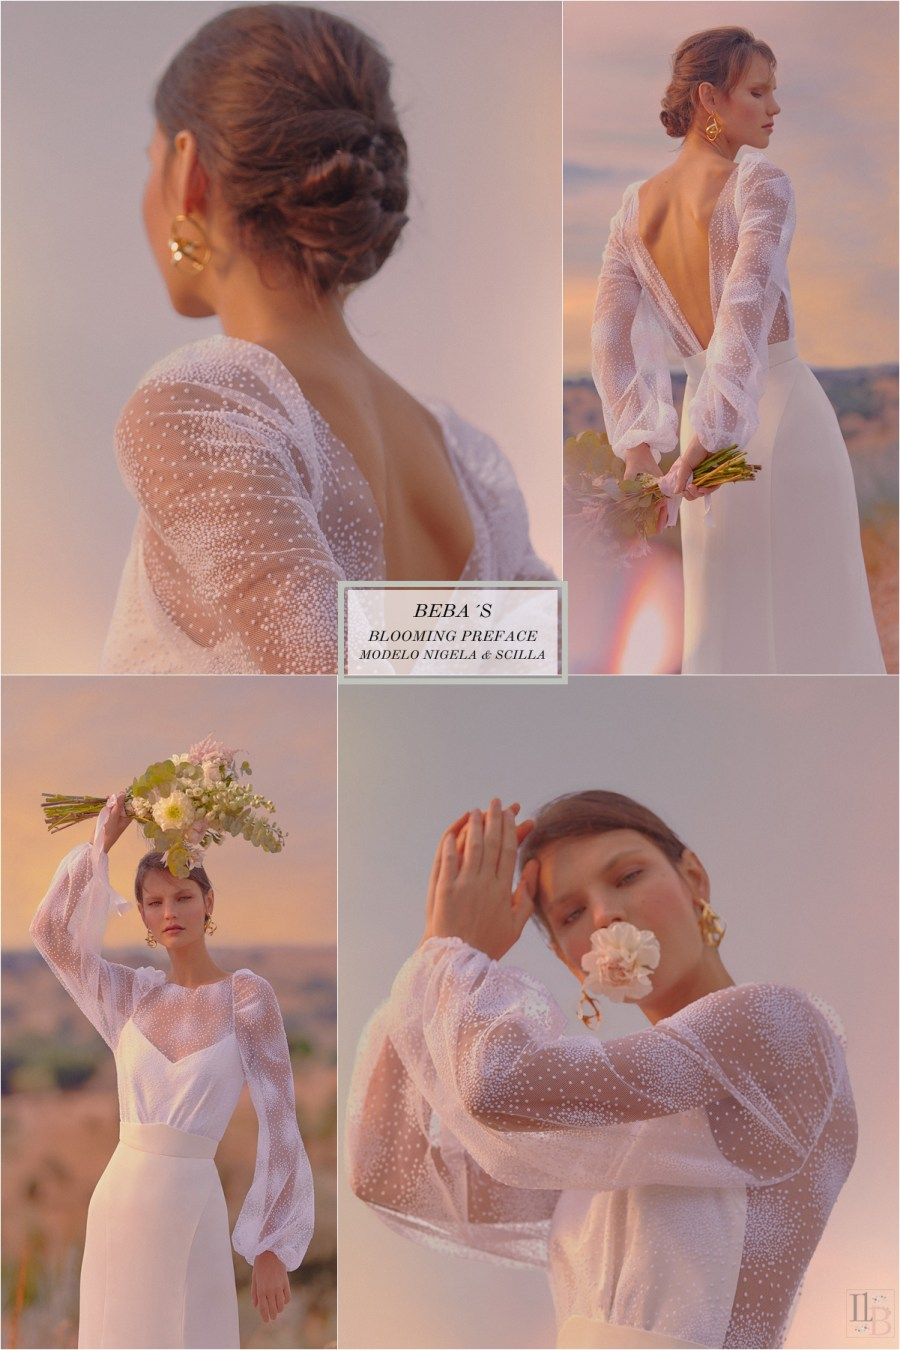 Blooming Preface - Beba´s . Modelo Nigela&Scilla